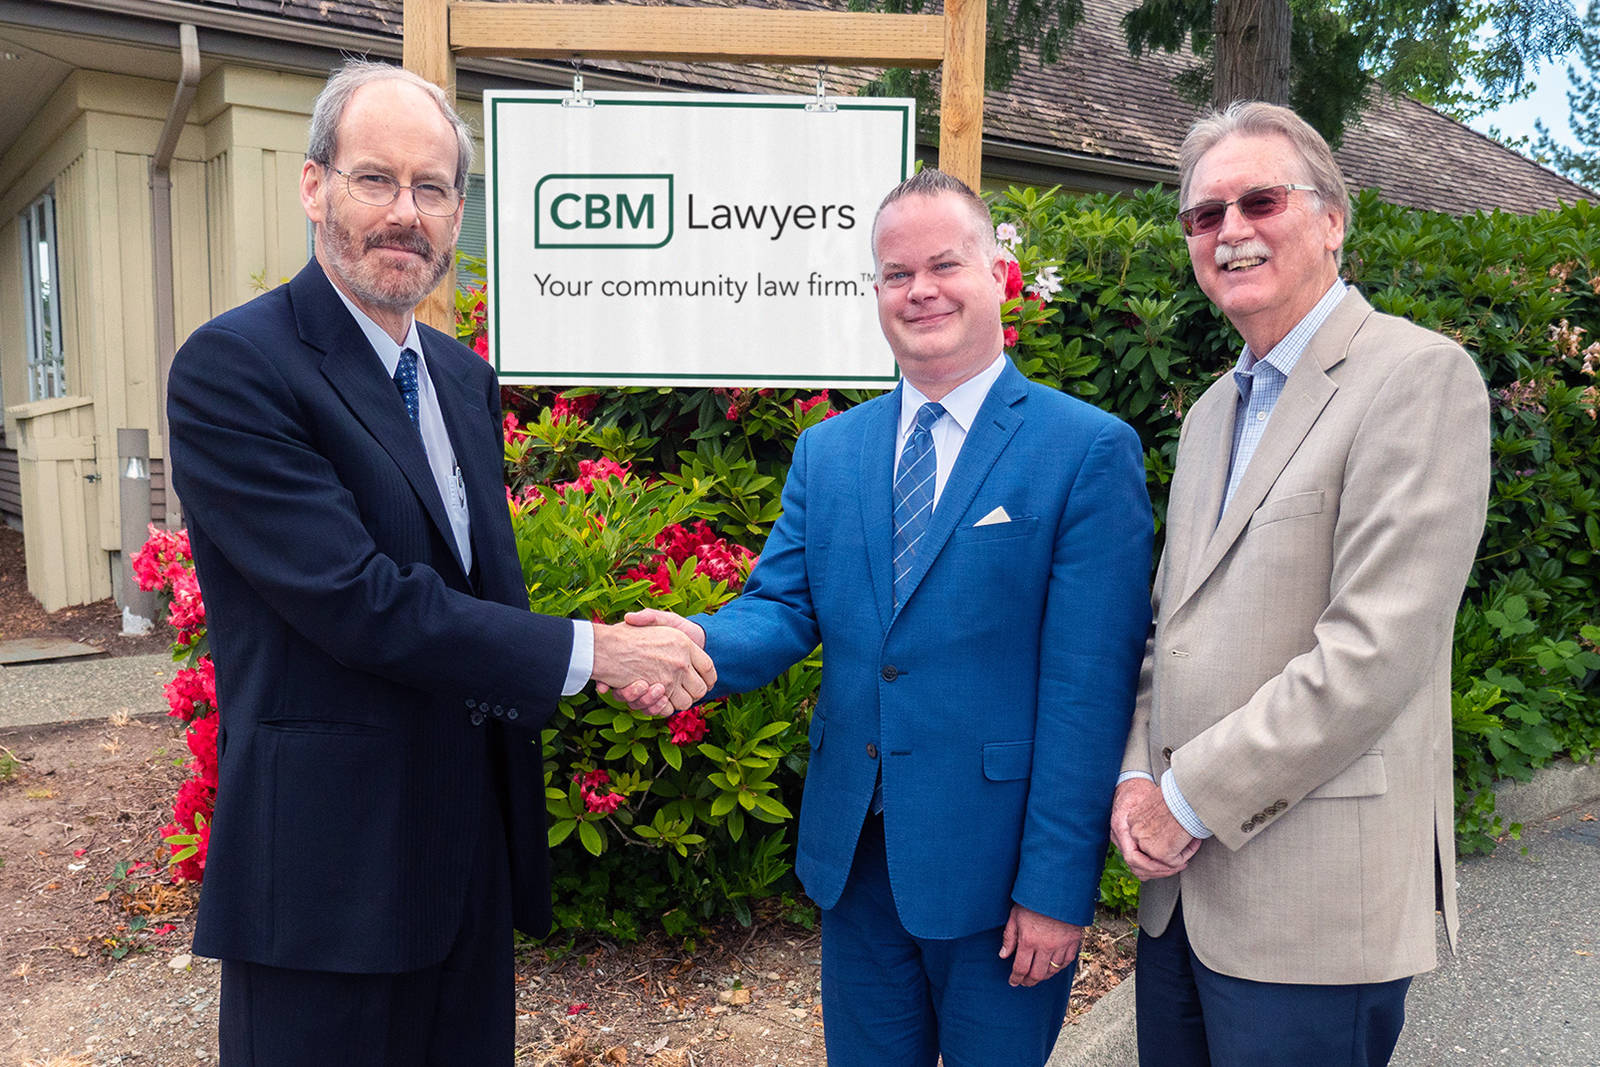 CBM Lawyers has expanded into Langley's Walnut Grove neighbourhood.